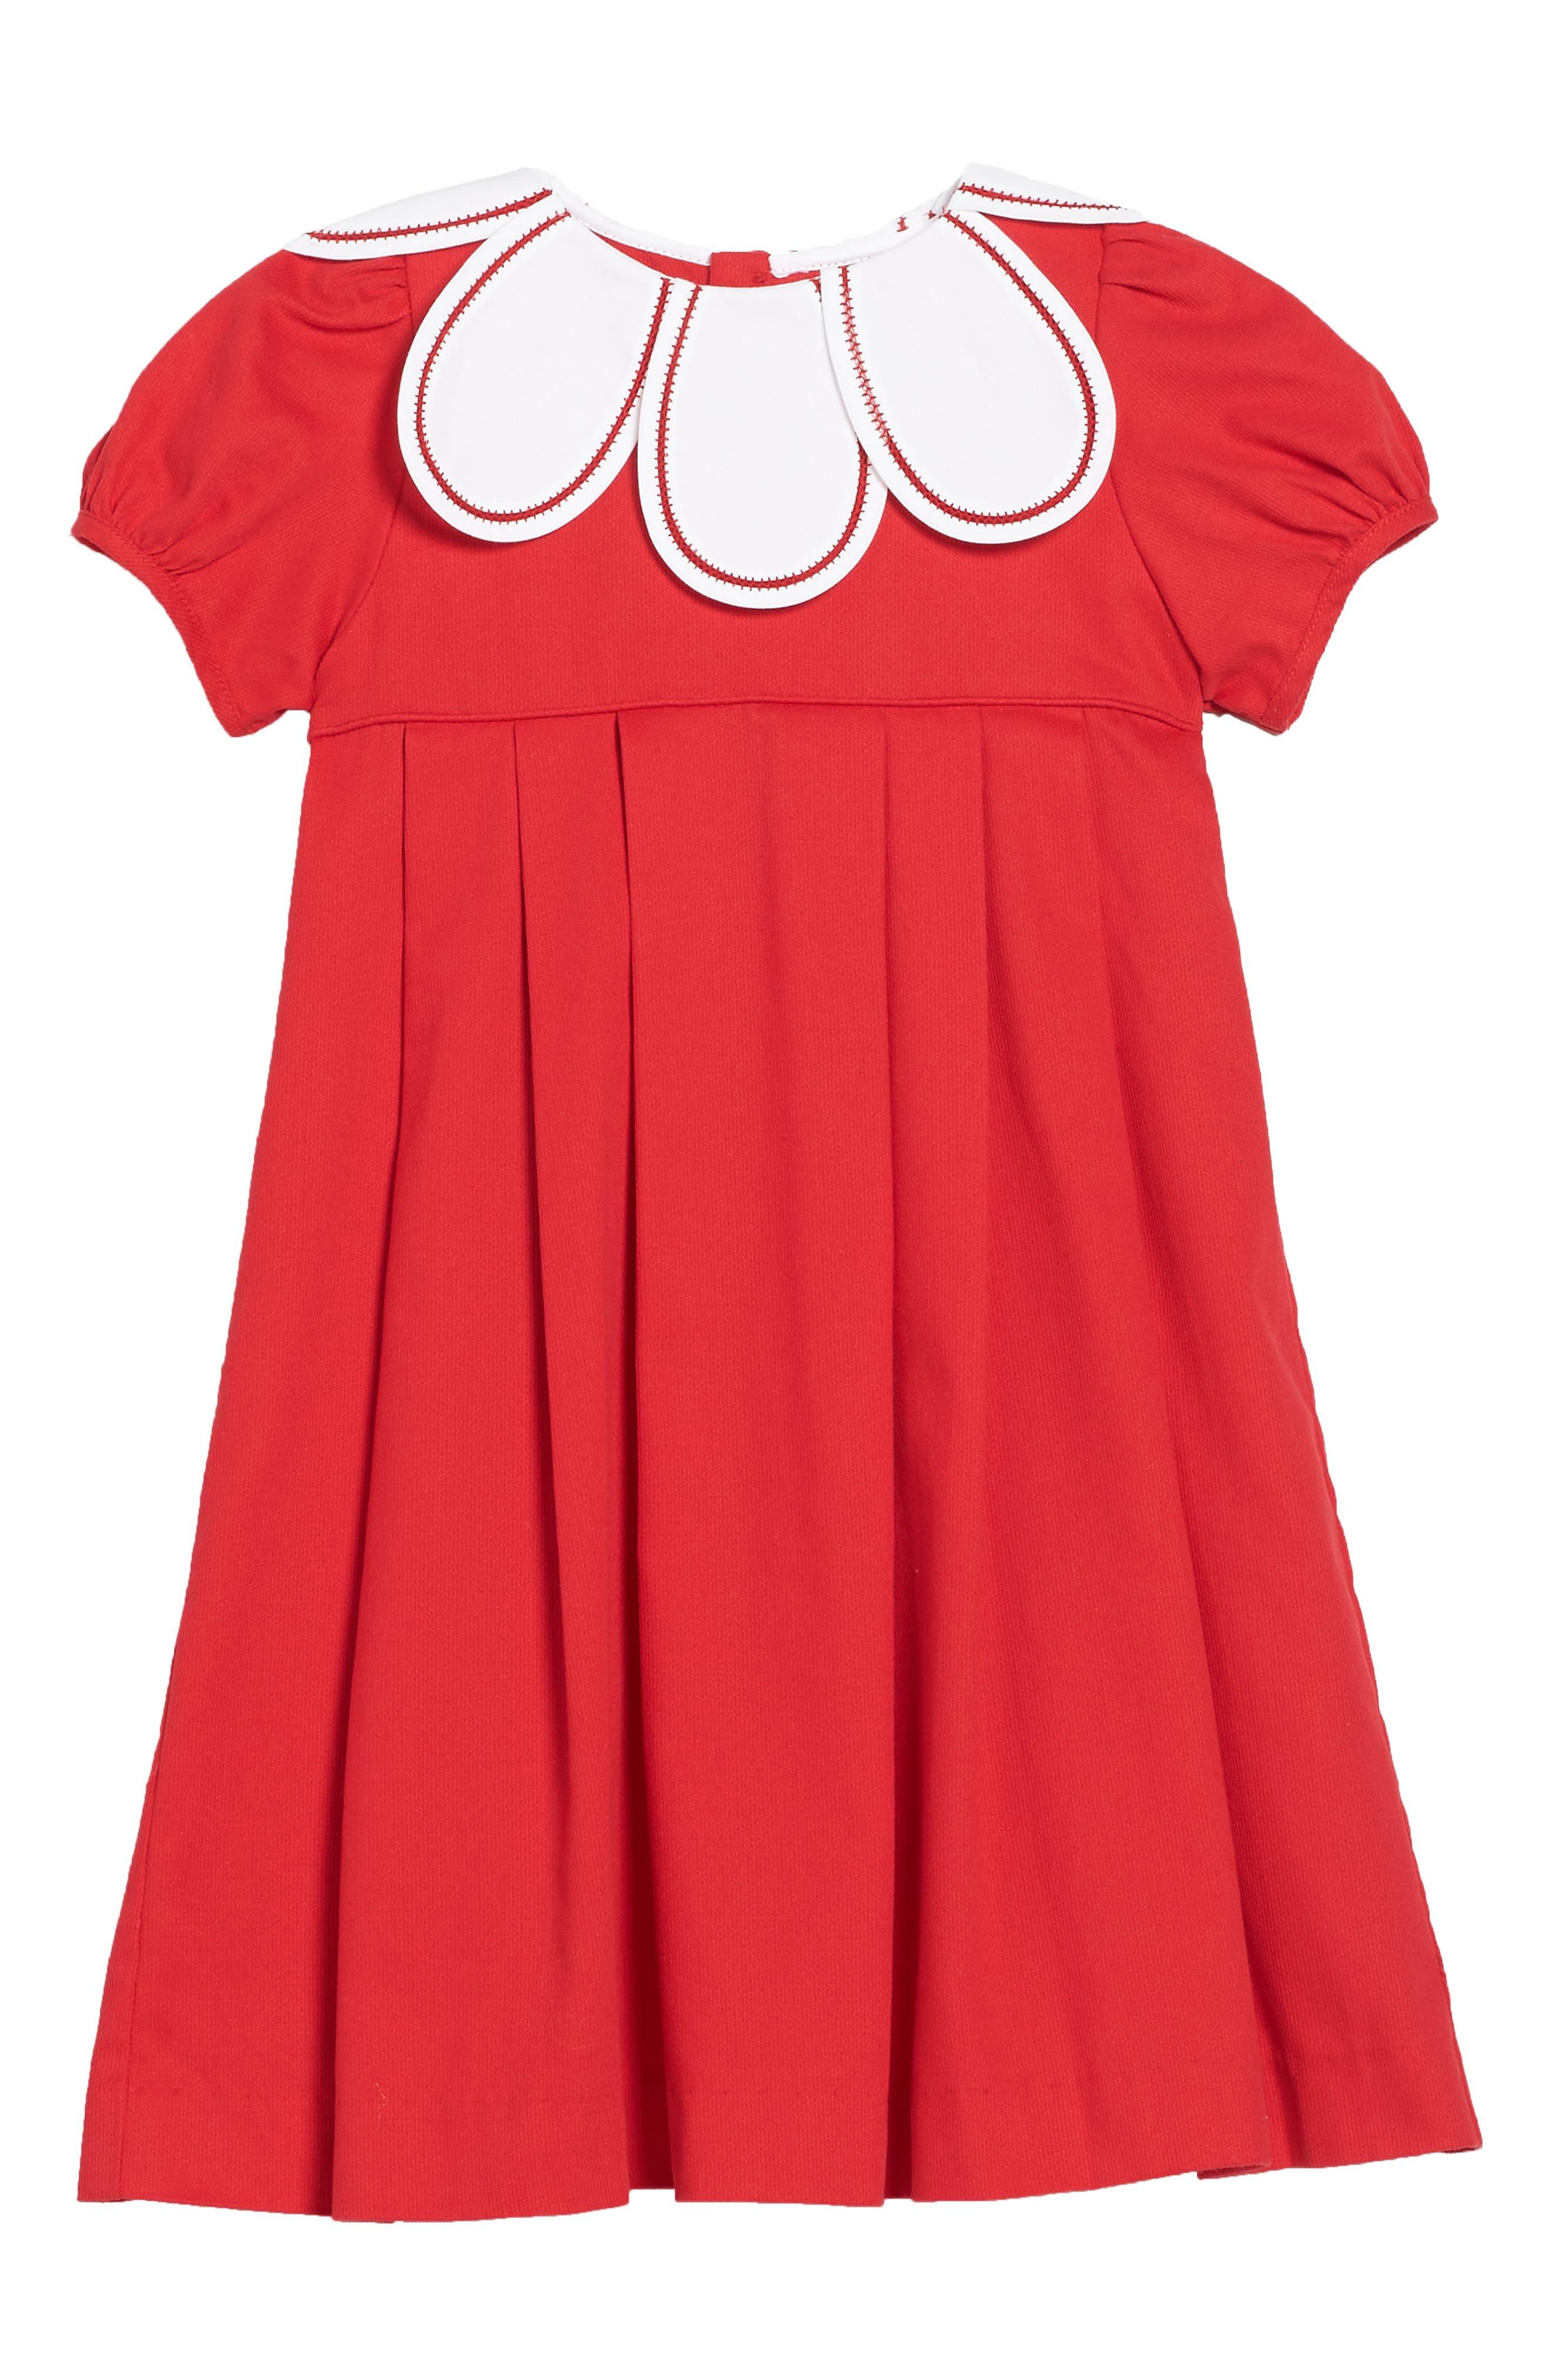 Alternate Image 1 Selected - Luli & Me Daisy Collar Corduroy Dress (Toddler Girls)